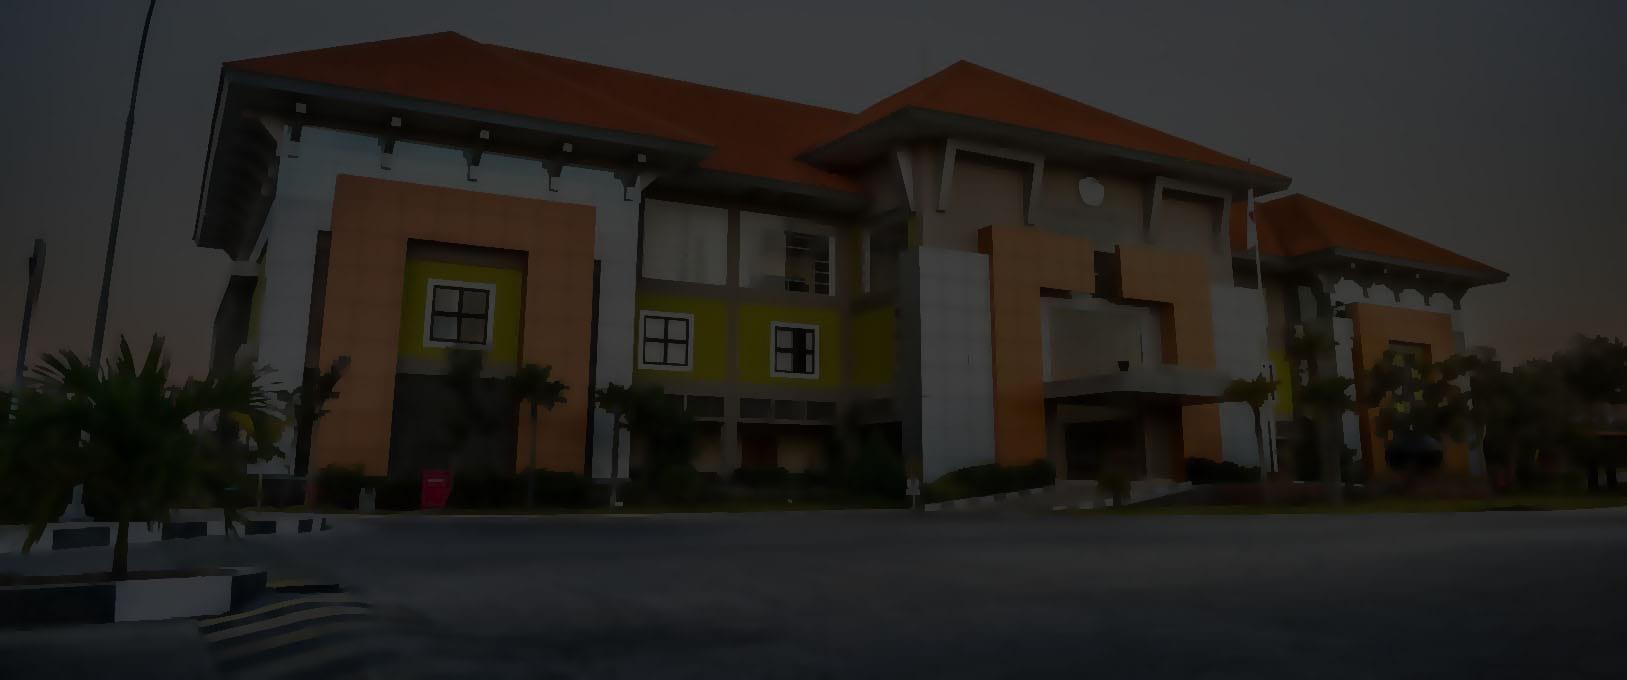 Biodata V2 0 Universitas Nusa Cendana Kupang Ntt